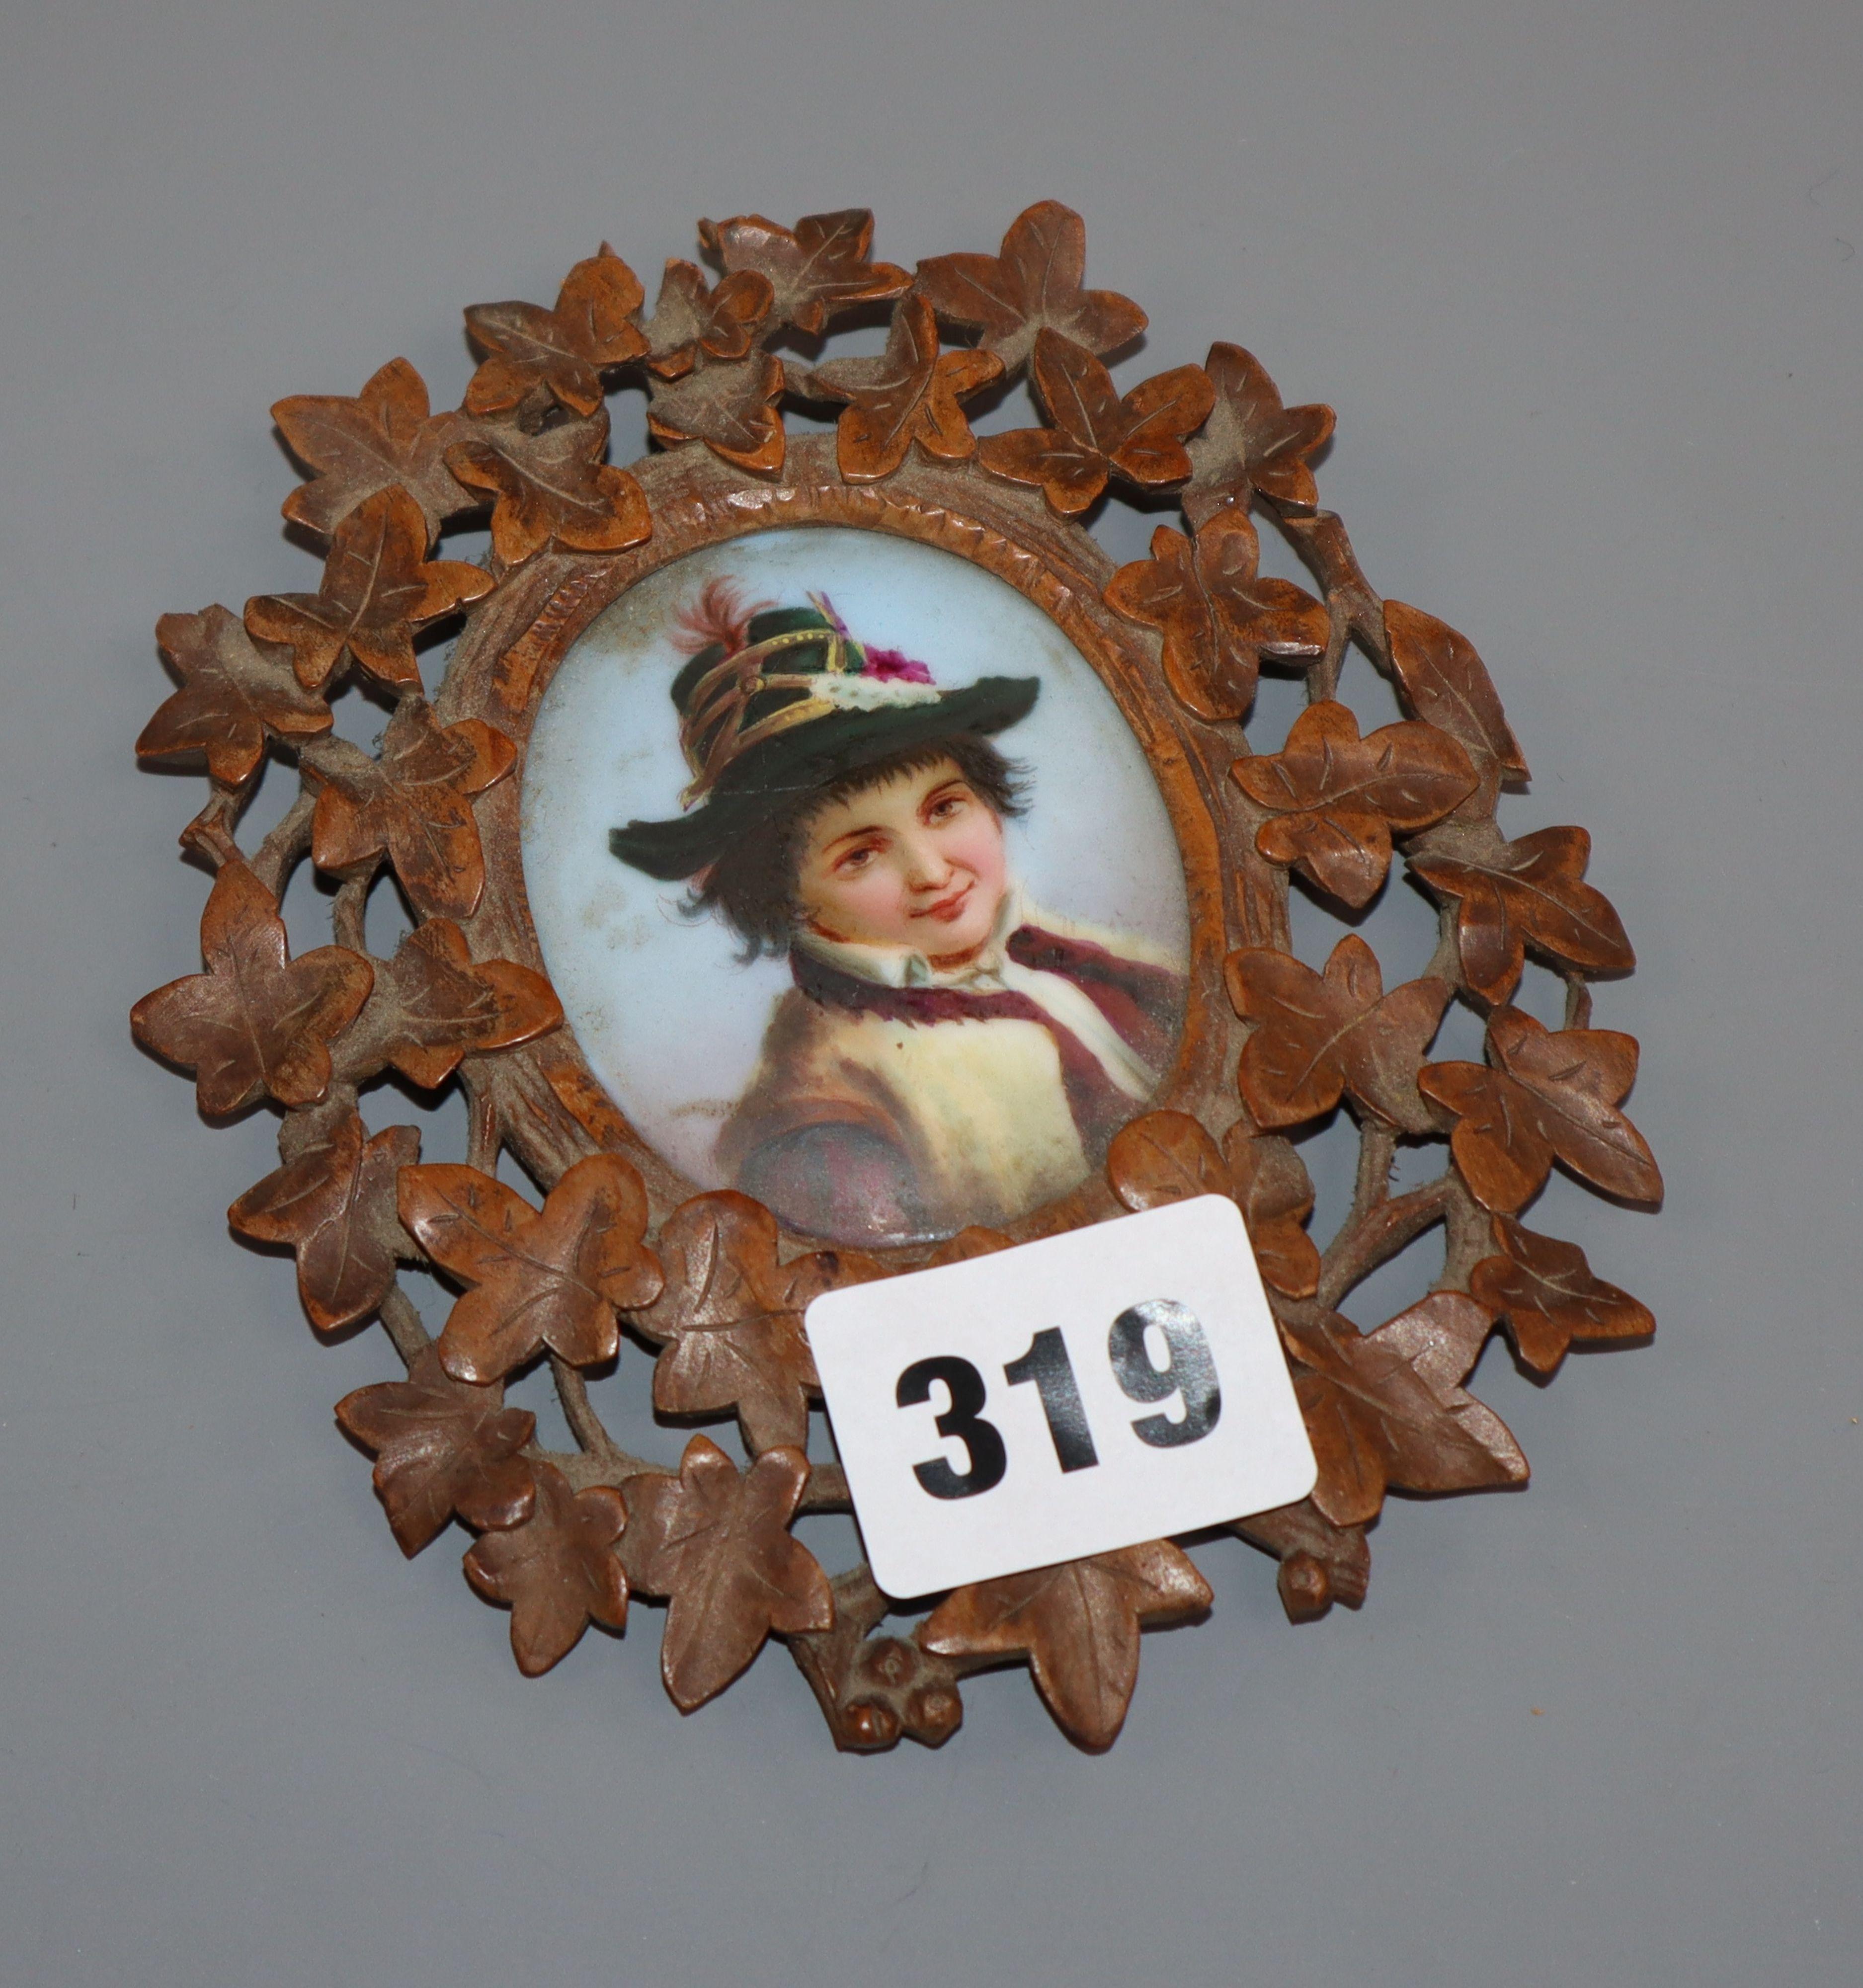 Lot 319 - A Black Forest framed porcelain portrait miniature